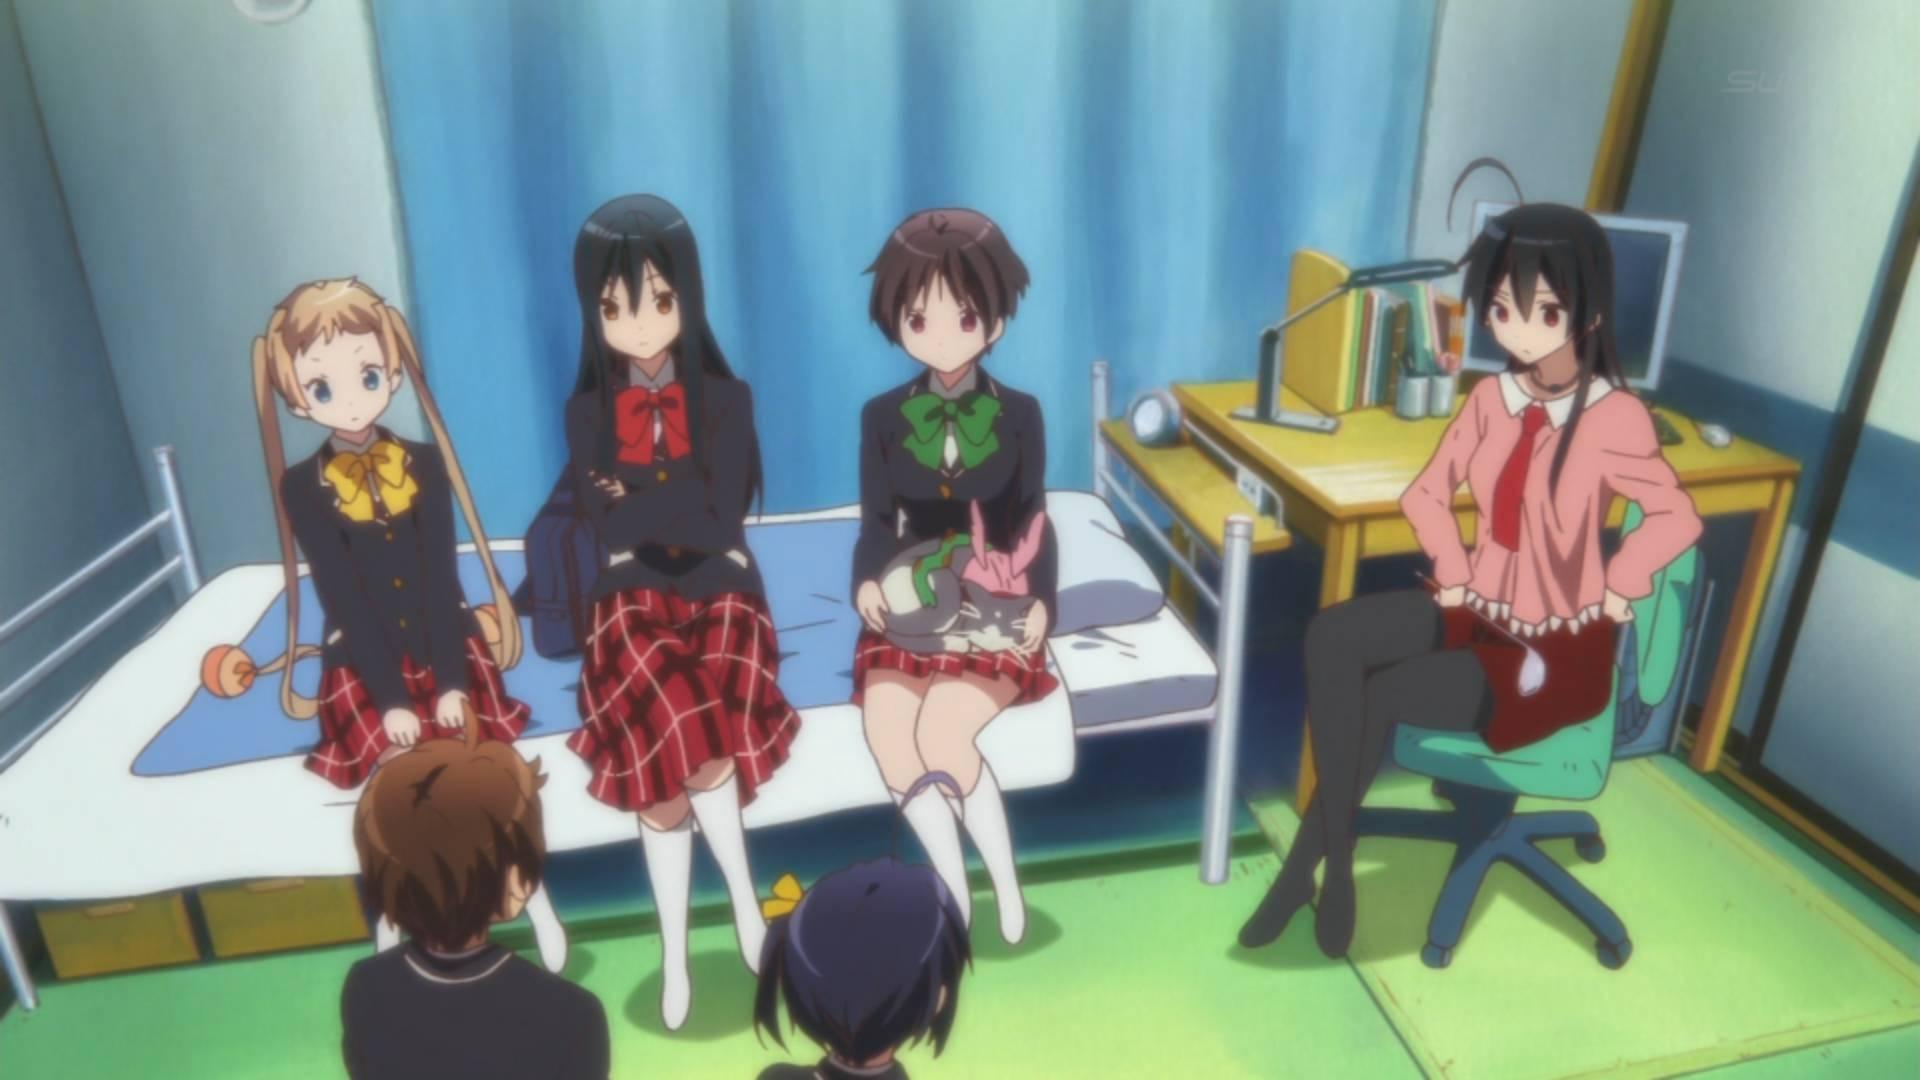 Featured image for Chuunibyou demo Koi ga Shitai! Ren Episode 1: Take Nothing Seriously